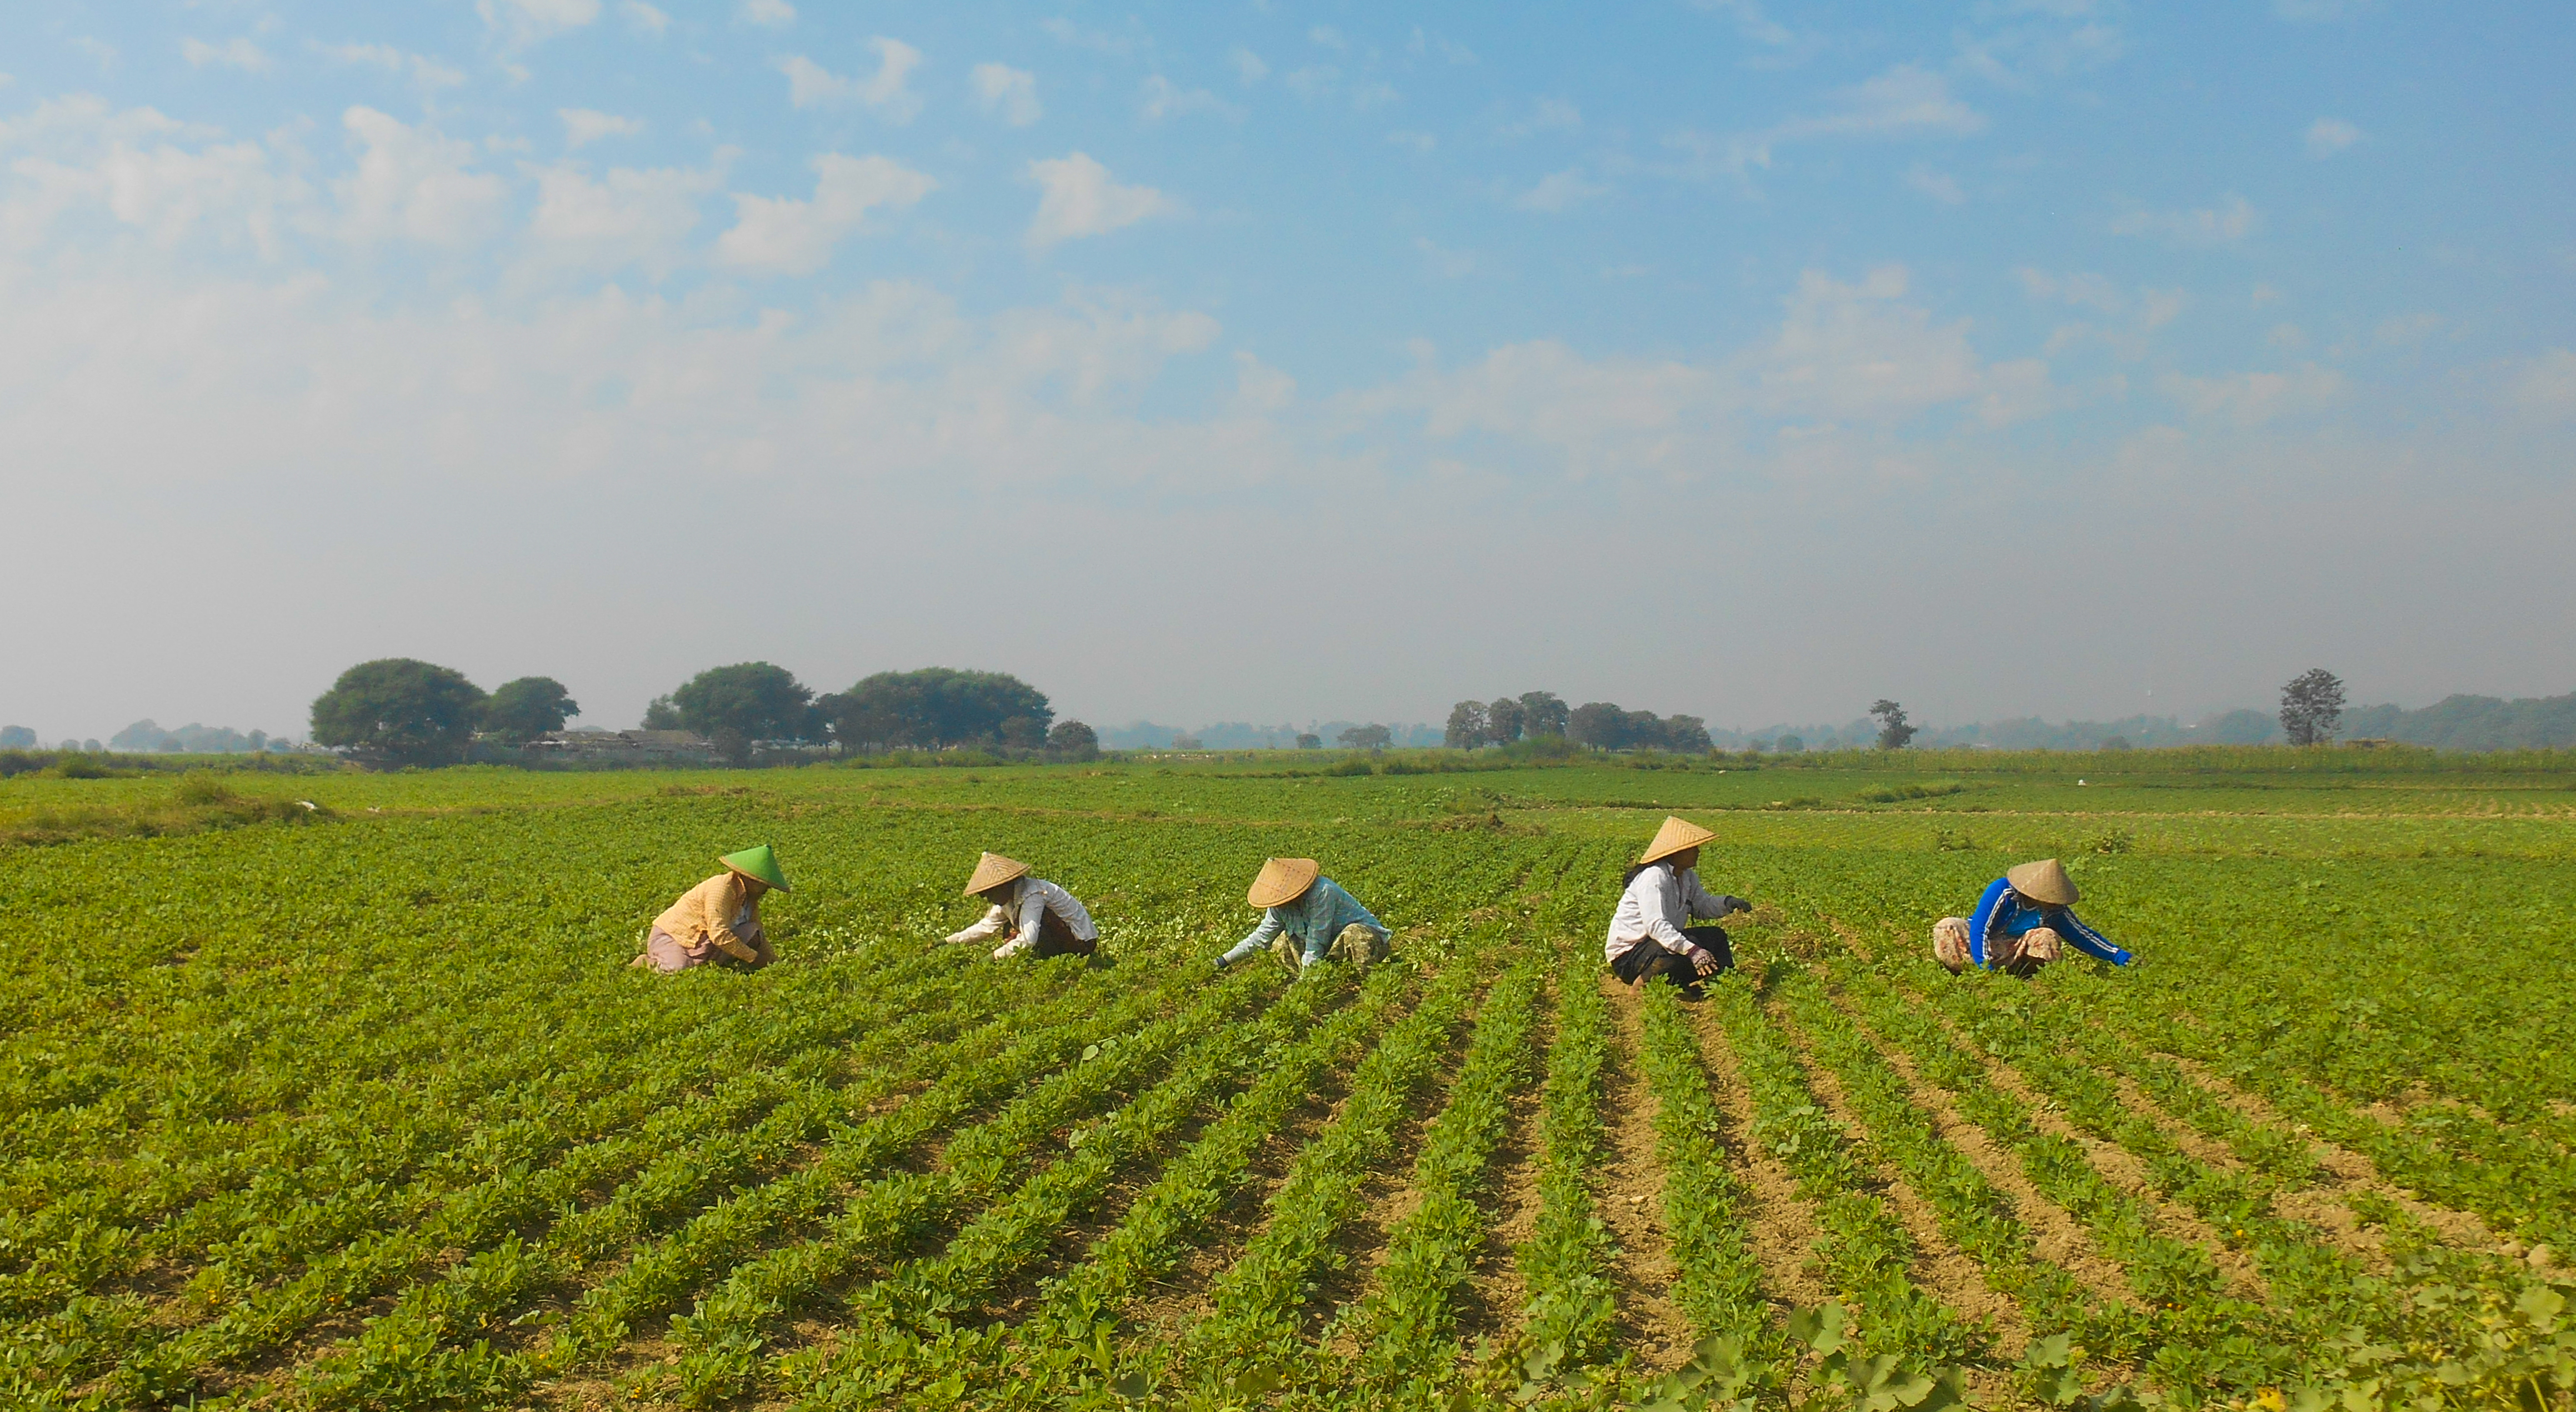 Farmers cultivating rice in Myanmar.